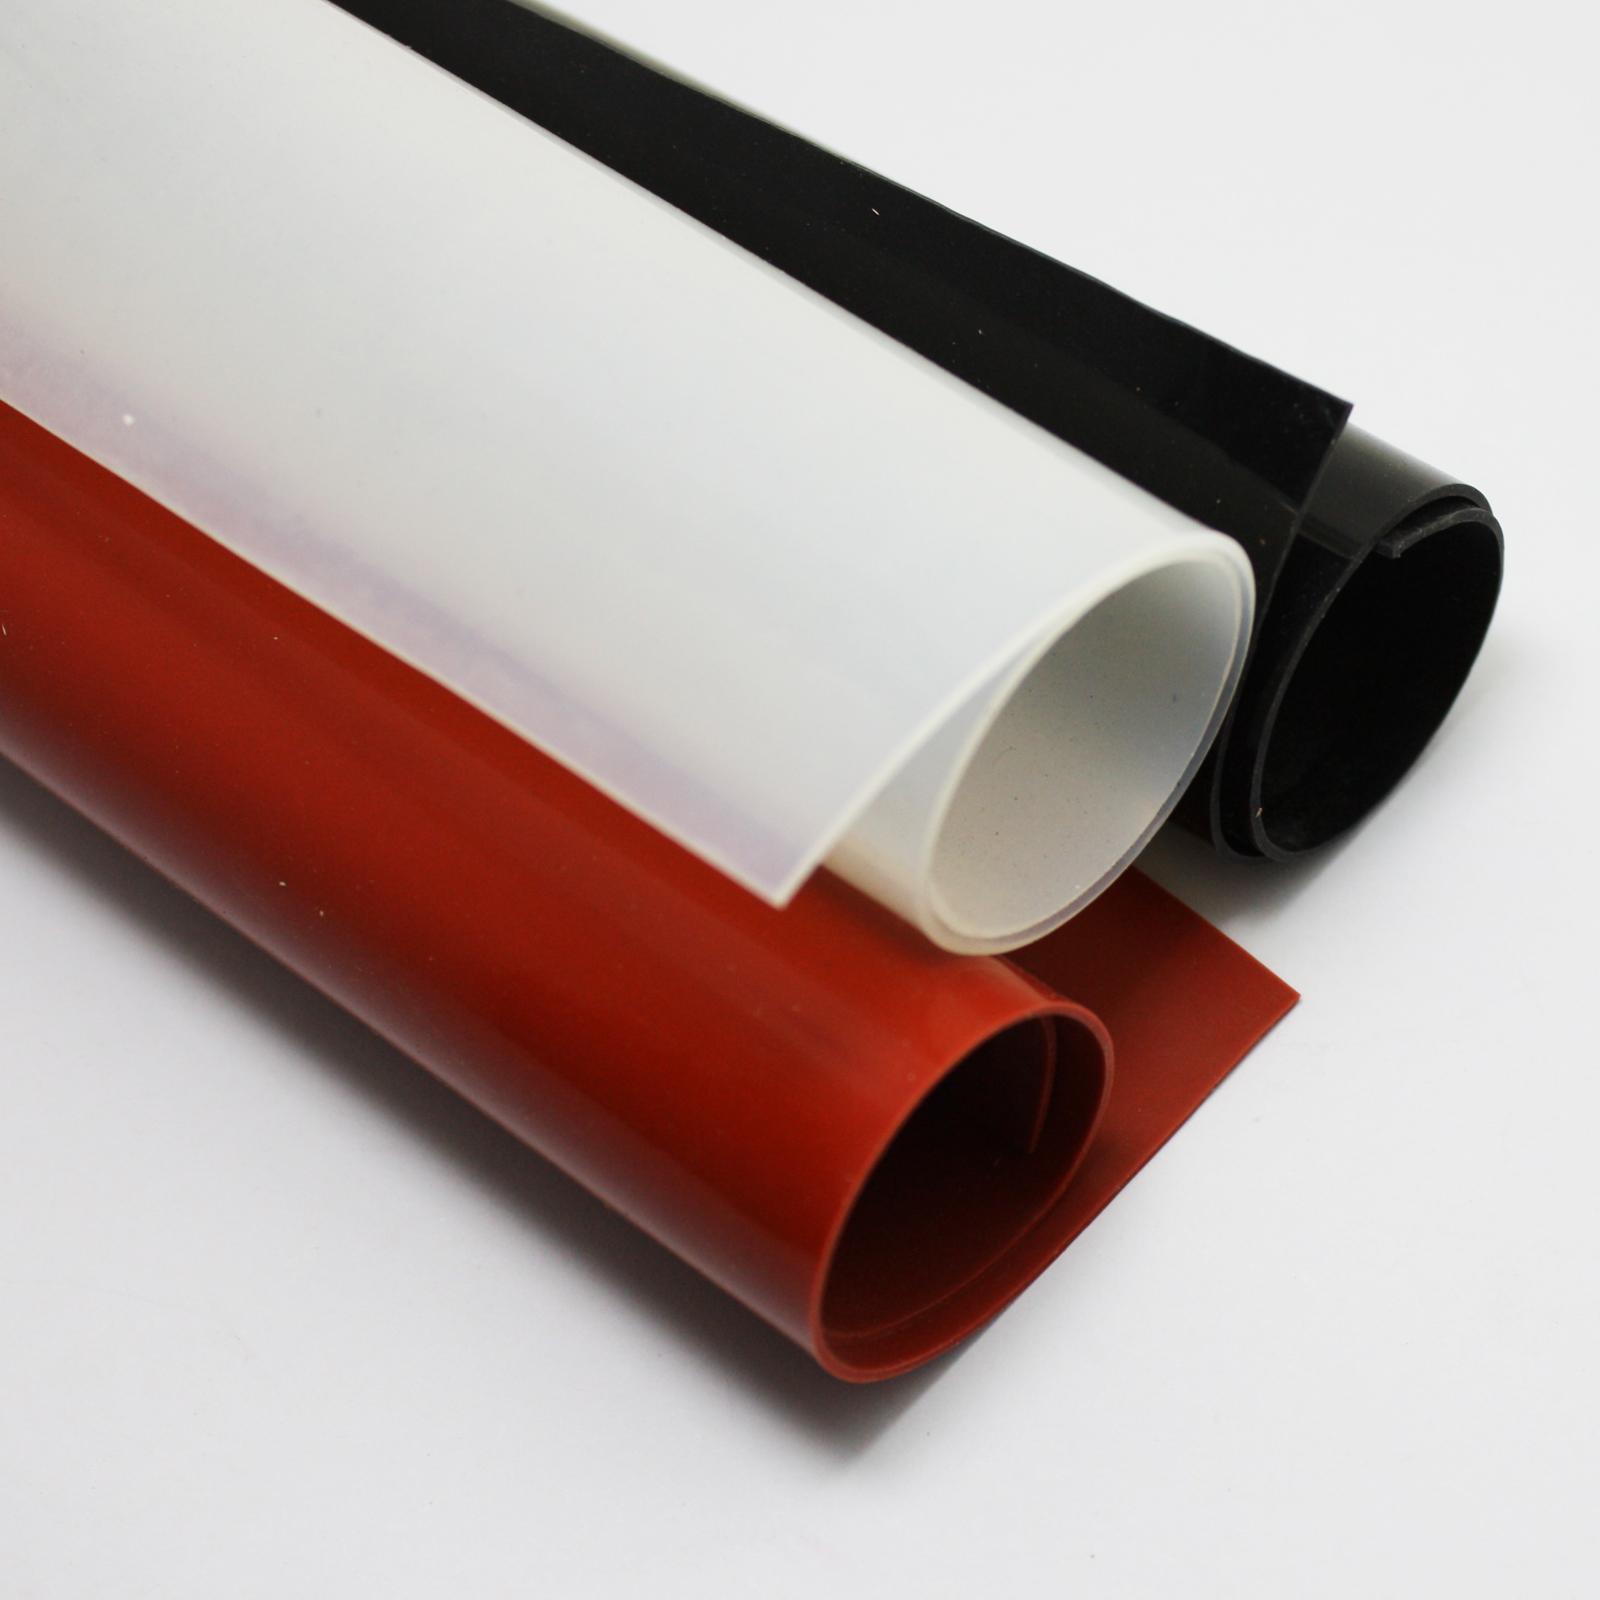 a4 a5 a6 silicone rouge noir blanc feuille plaque. Black Bedroom Furniture Sets. Home Design Ideas